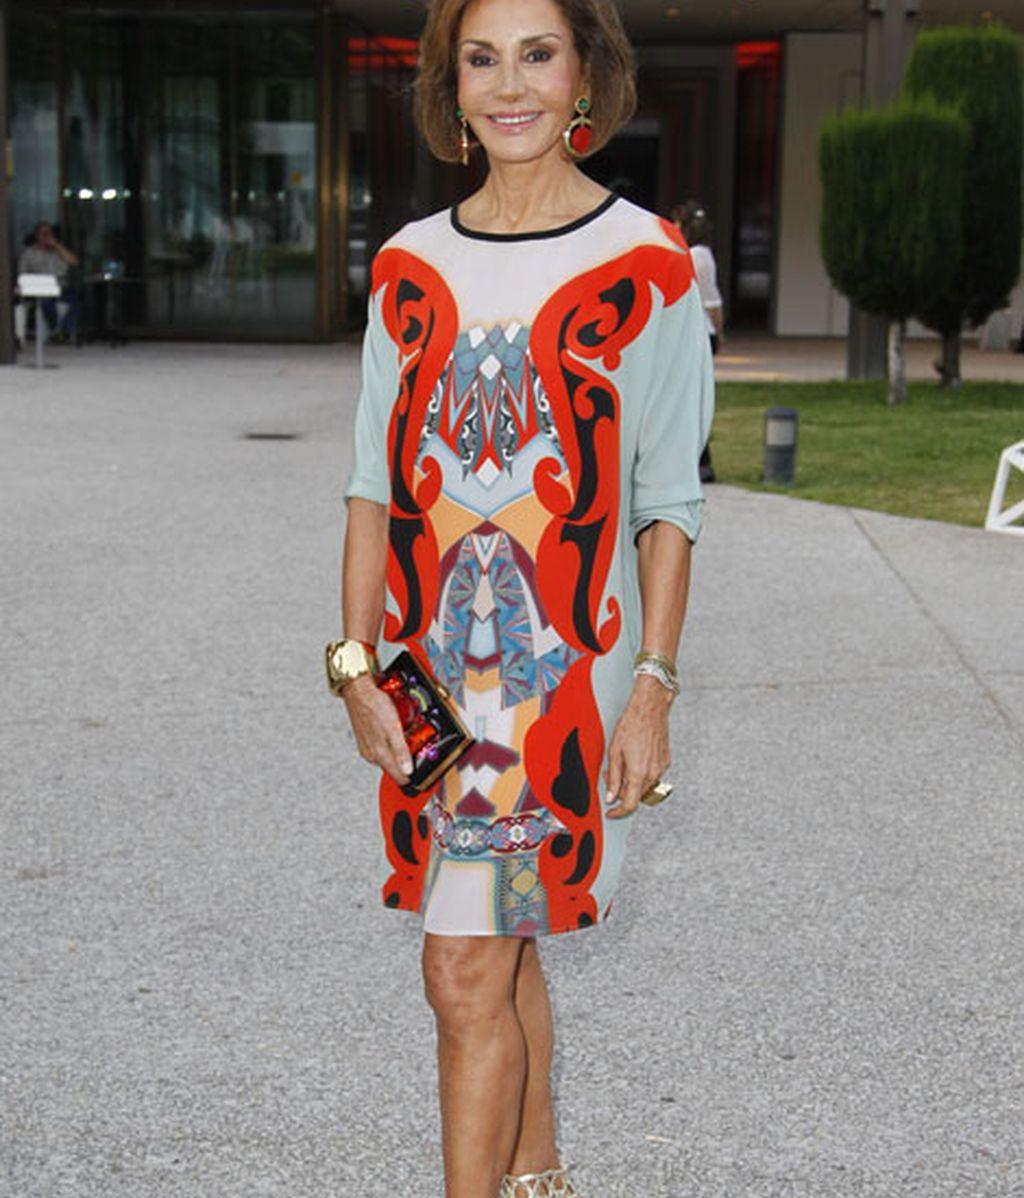 Nati Abascal no quiso faltar como gran amante de la moda